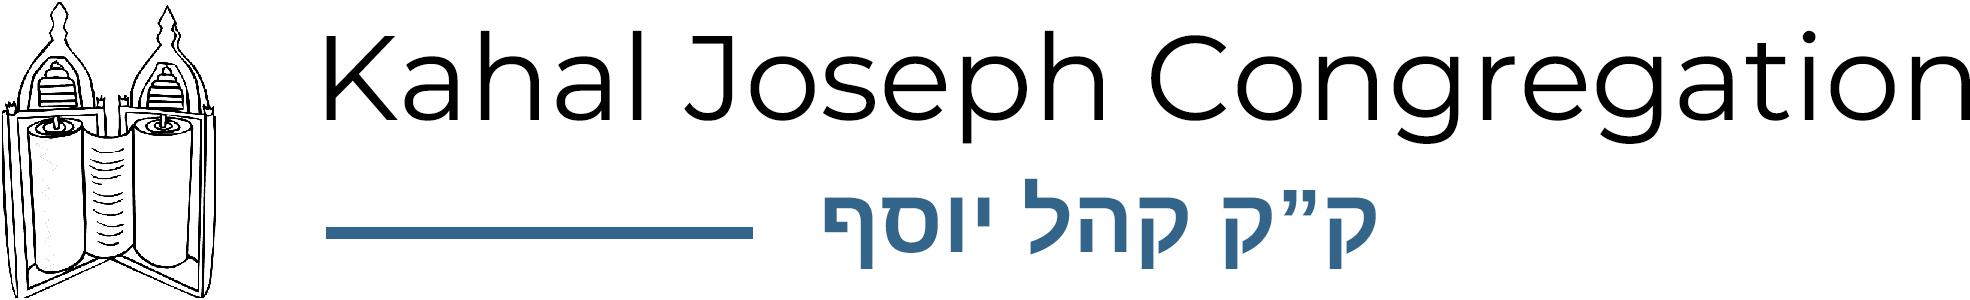 Kahal Joseph Congregation